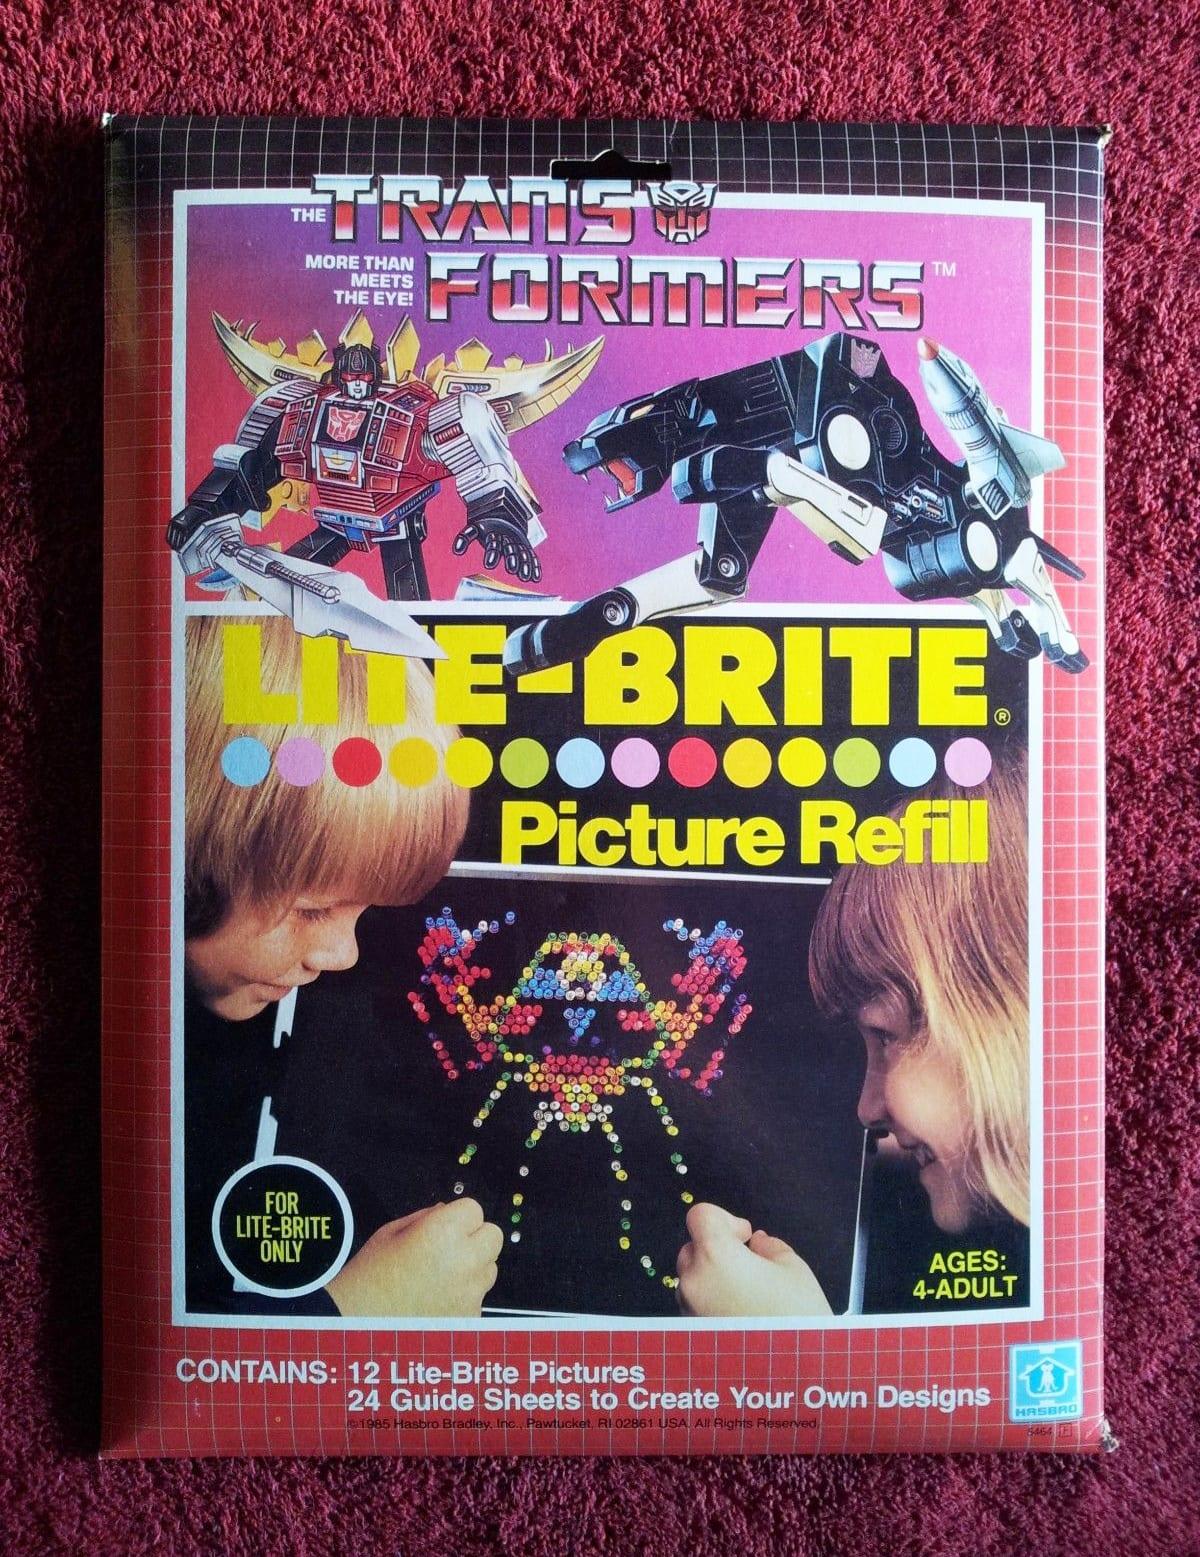 Transformers Lite-Brite